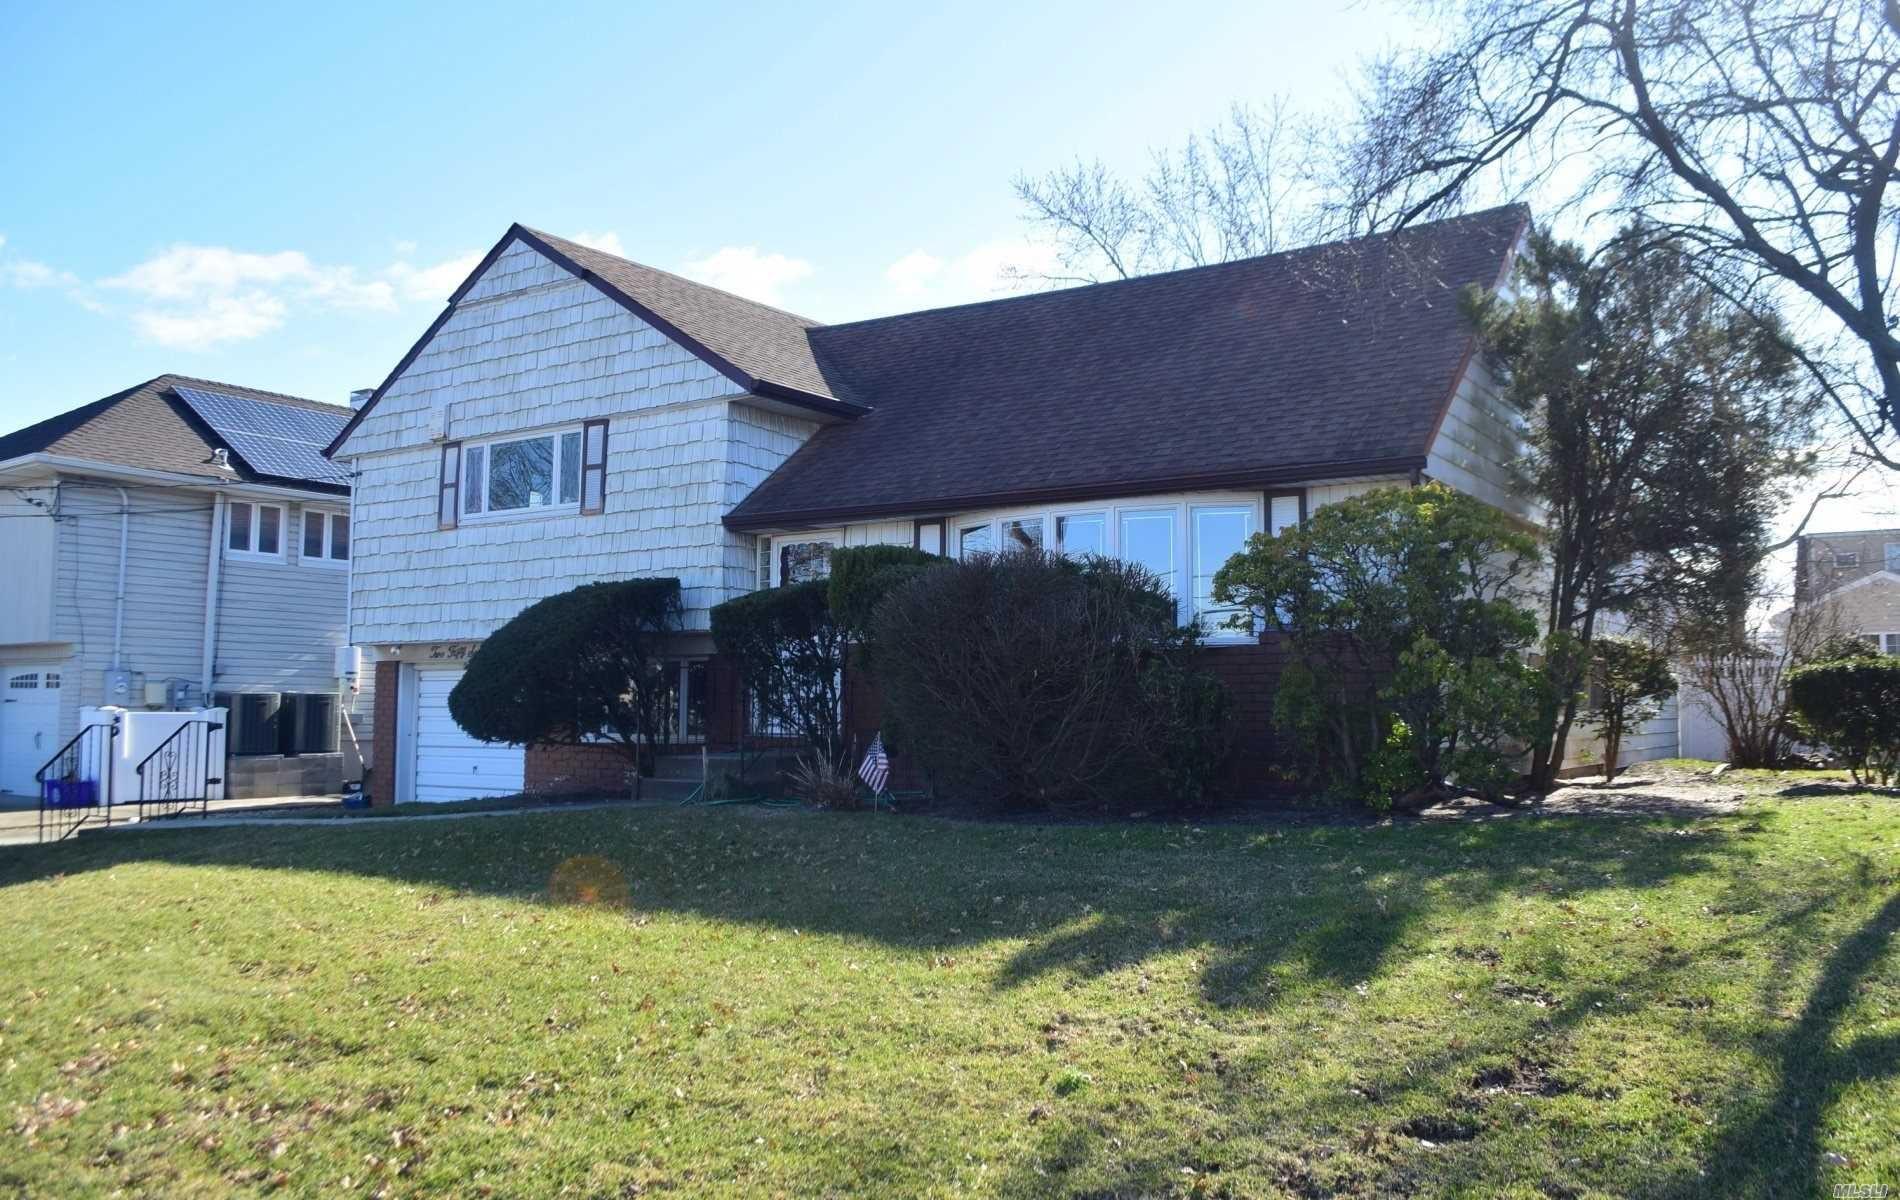 257 Vermont Avenue, Oceanside, NY 11572 - MLS#: 3195528